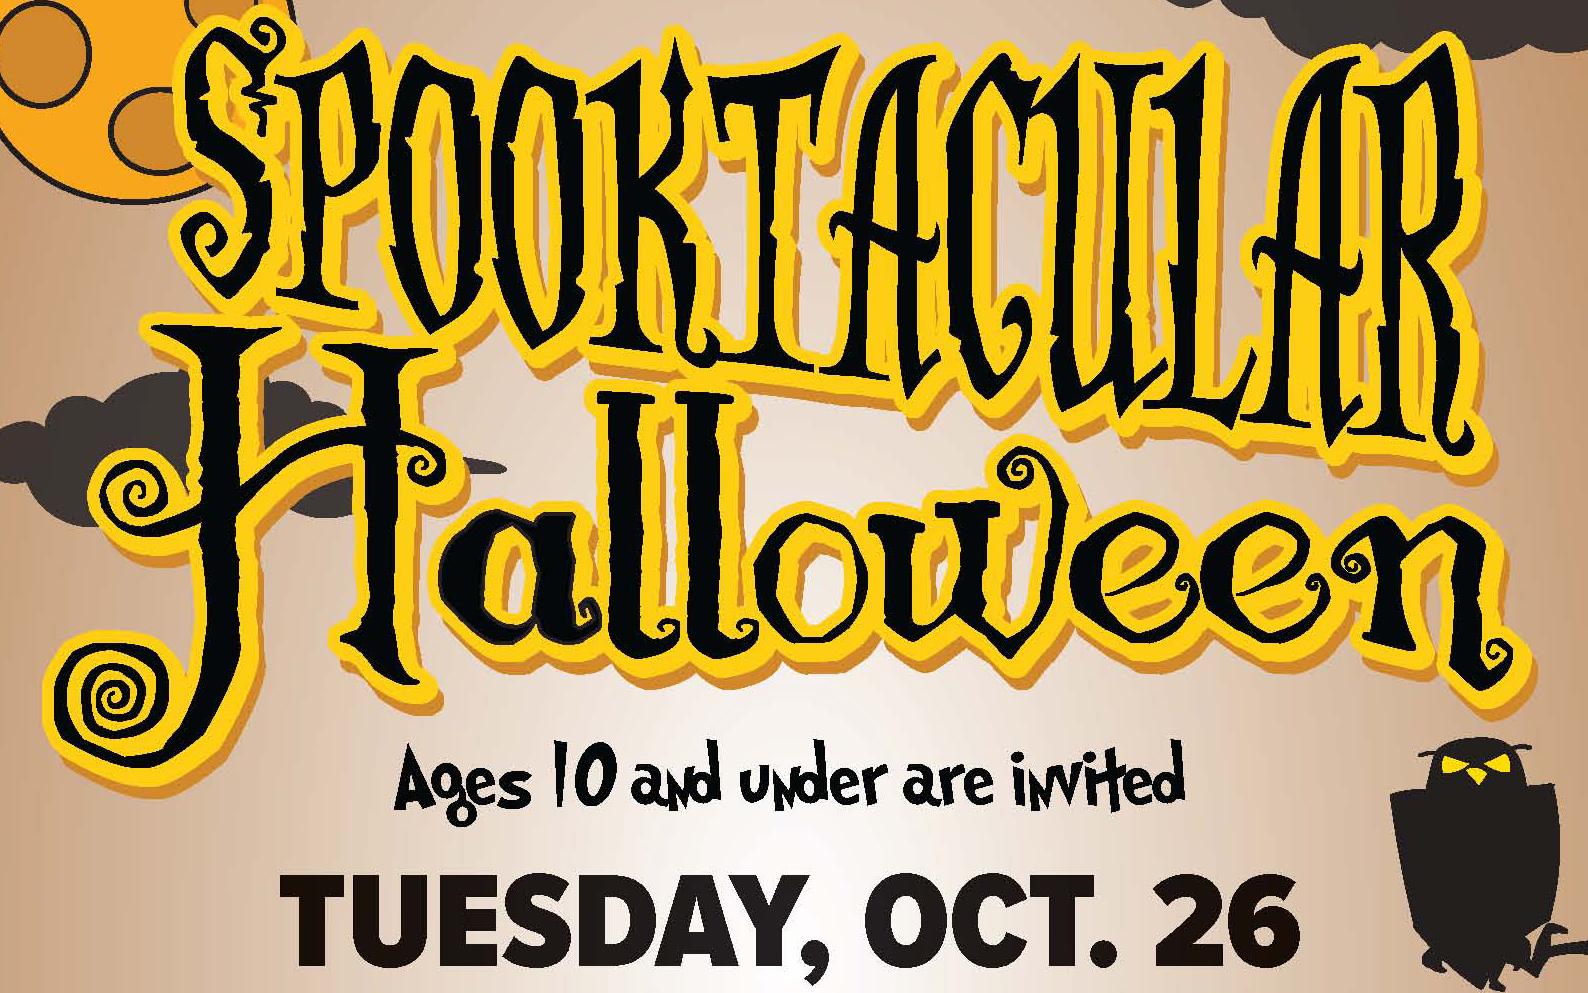 Free Spooktacular Halloween